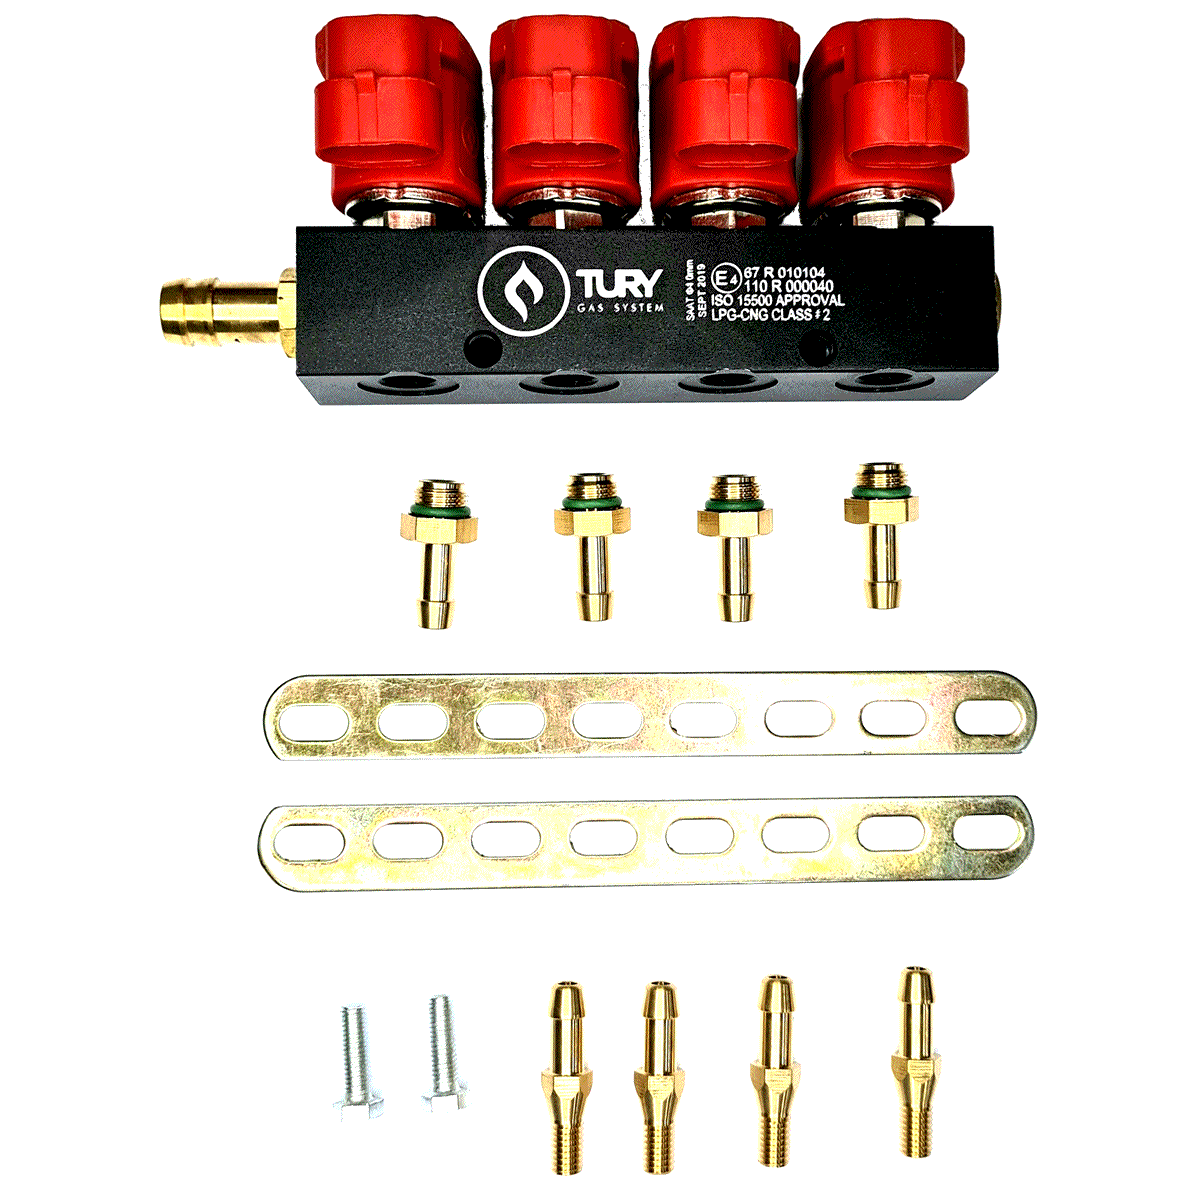 Flauta 4 Bicos GNV 5ª geração Rampa TURY STAG VALTEK GAS